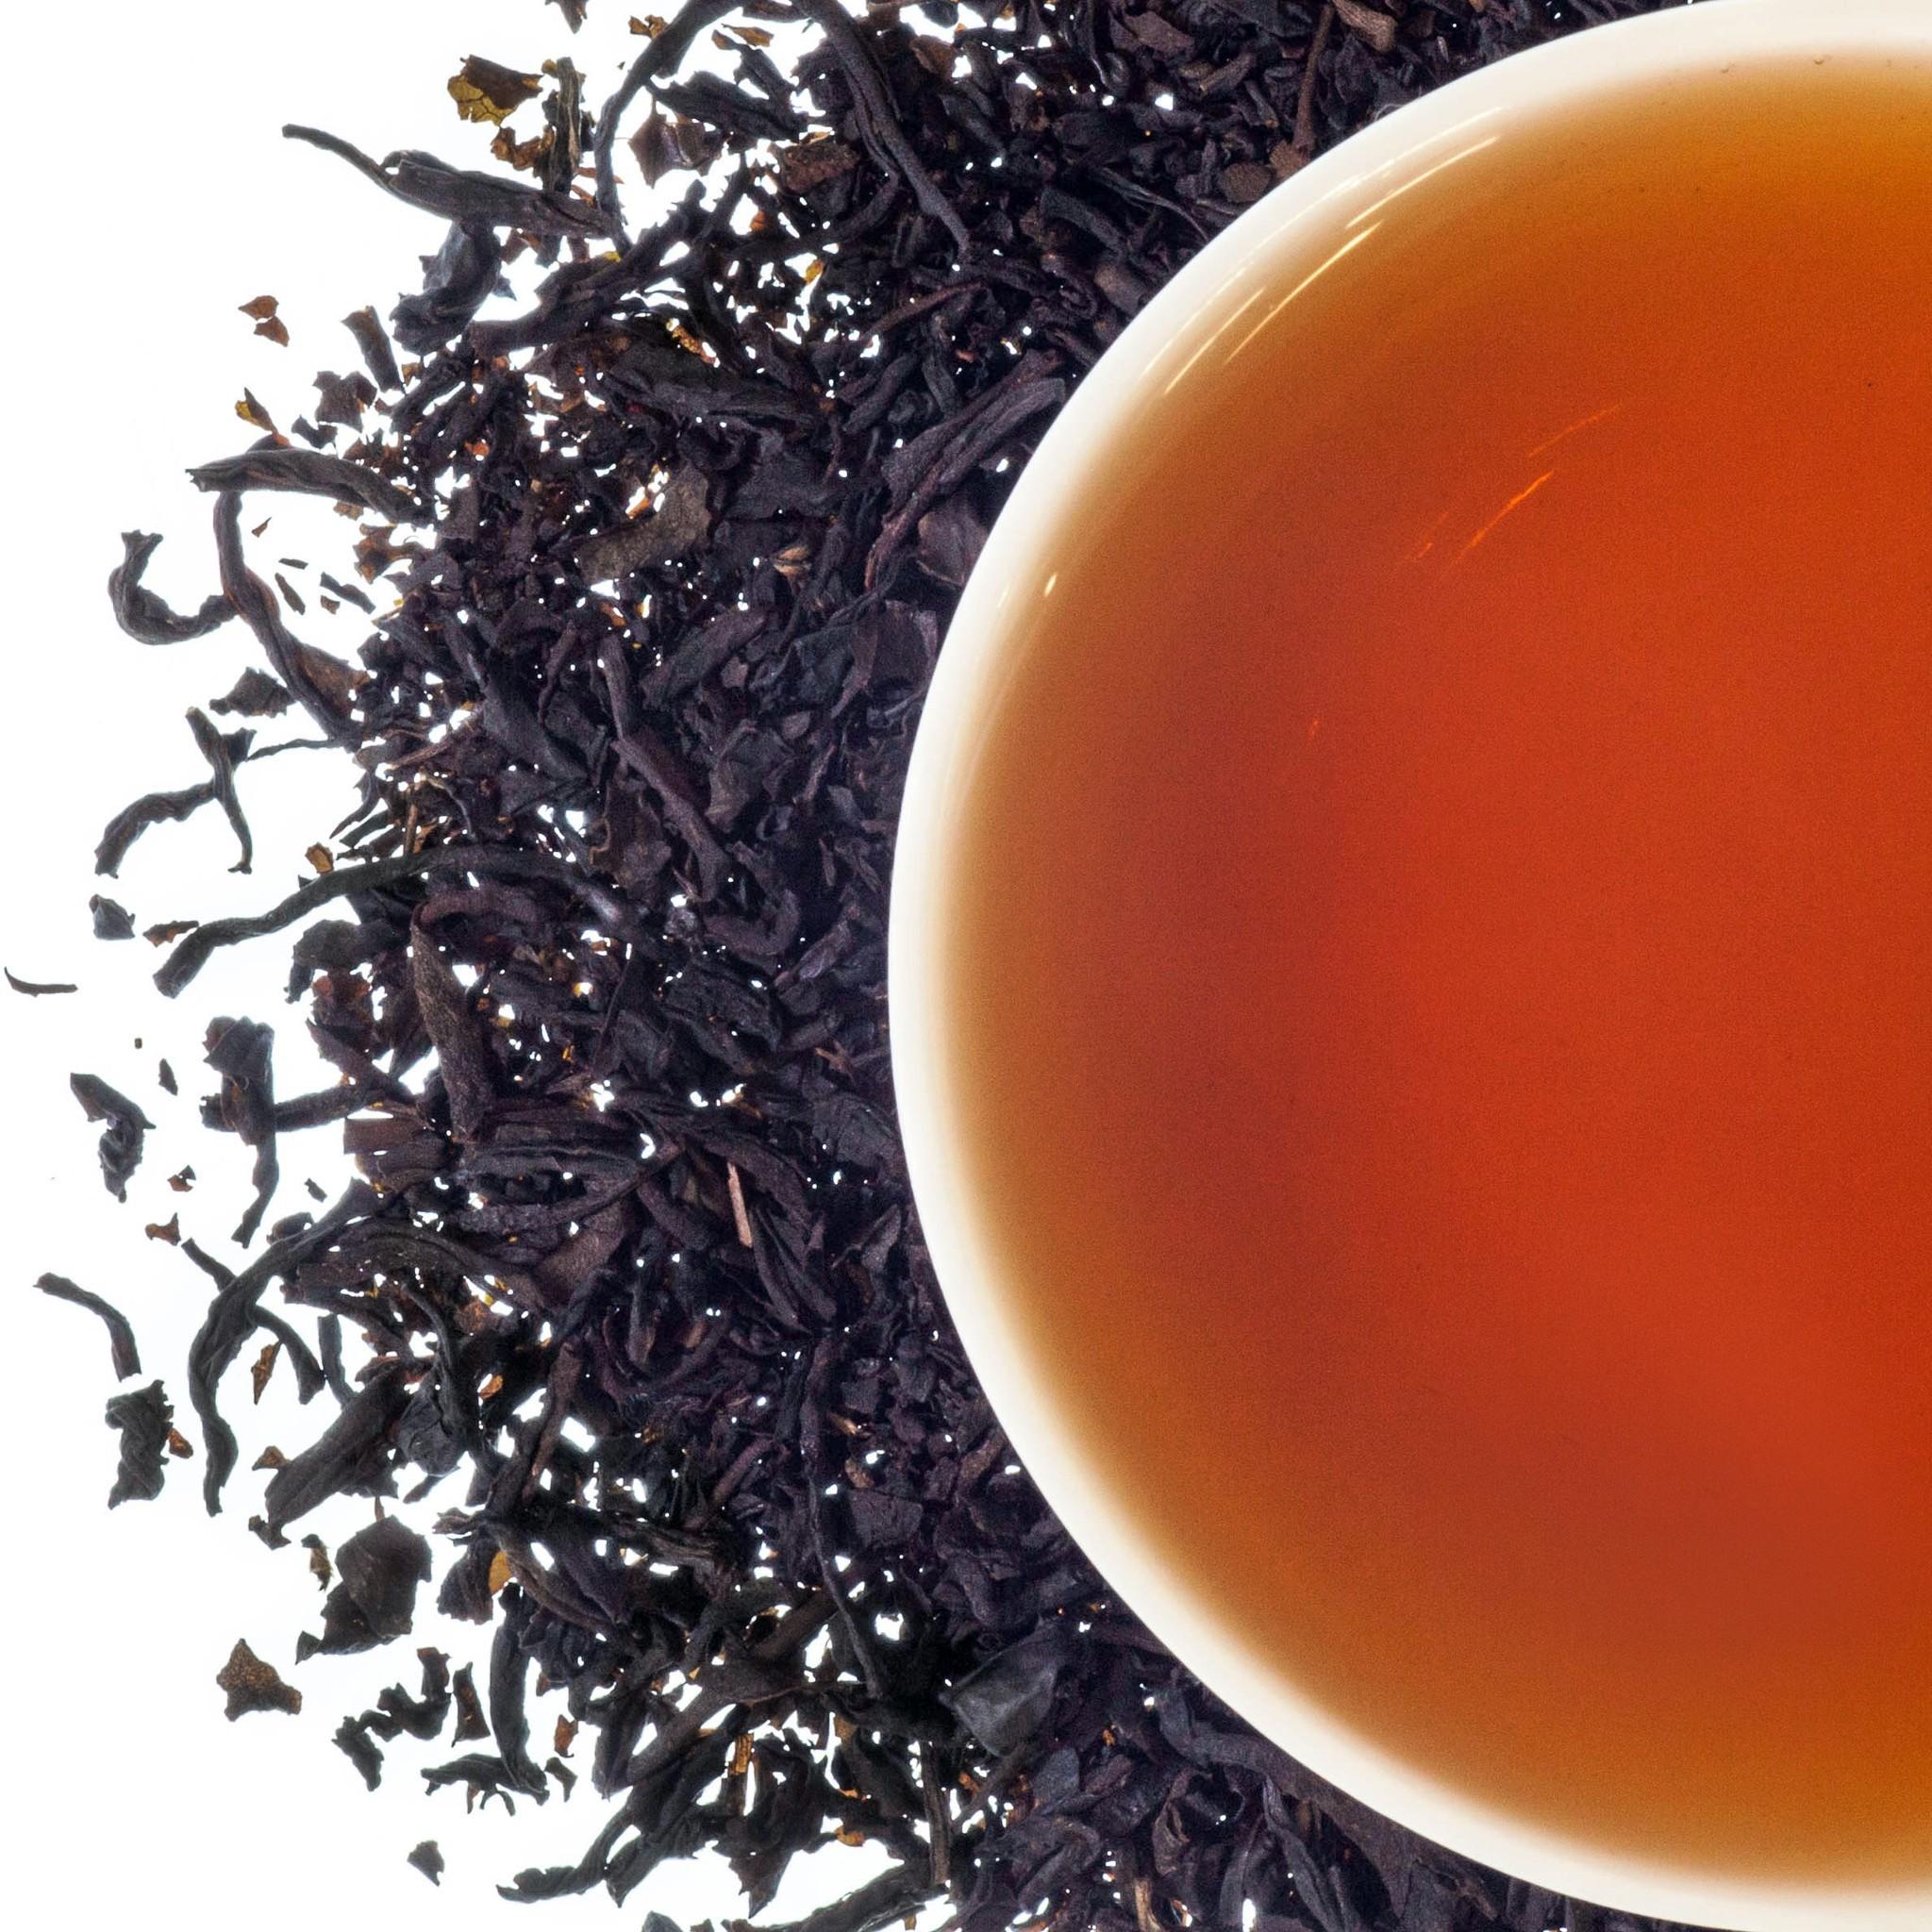 schwarzer tee gesunde ernährung toller geschmack